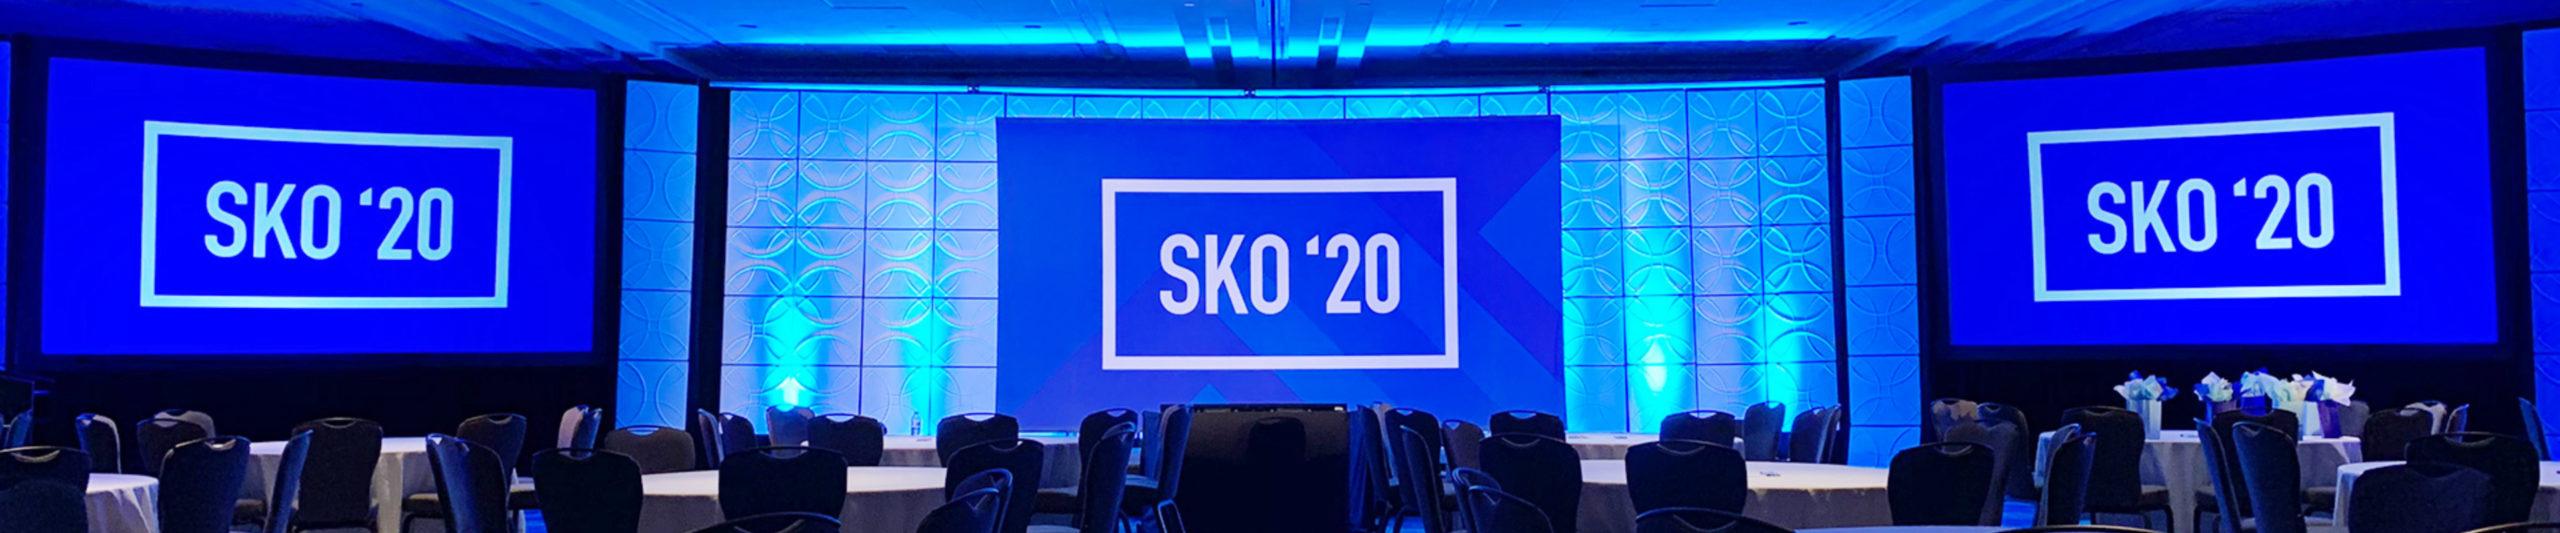 sko20-stage